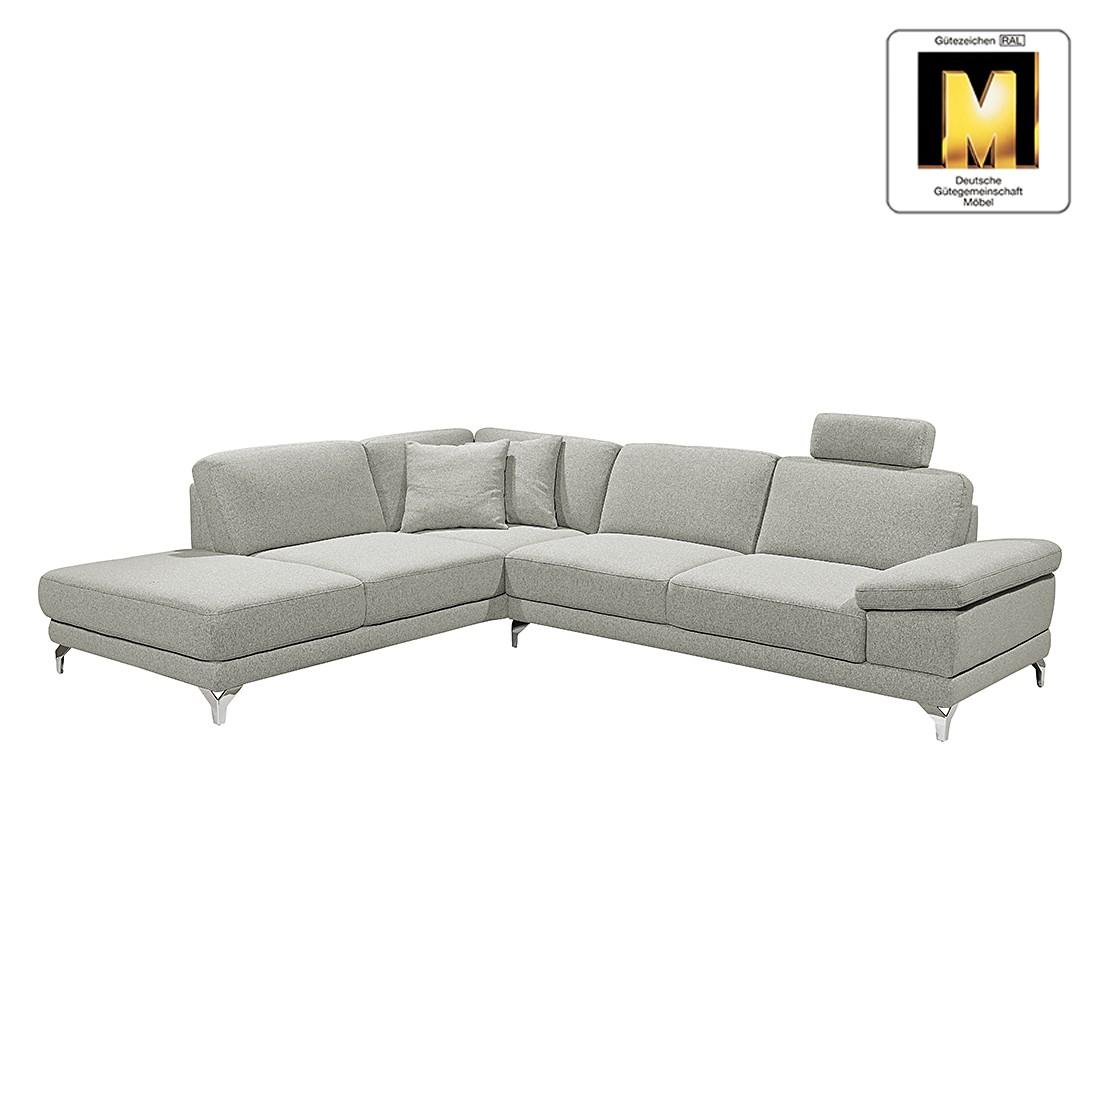 ecksofa casual line strukturstoff longchair ottomane davorstehend links verstellbare. Black Bedroom Furniture Sets. Home Design Ideas